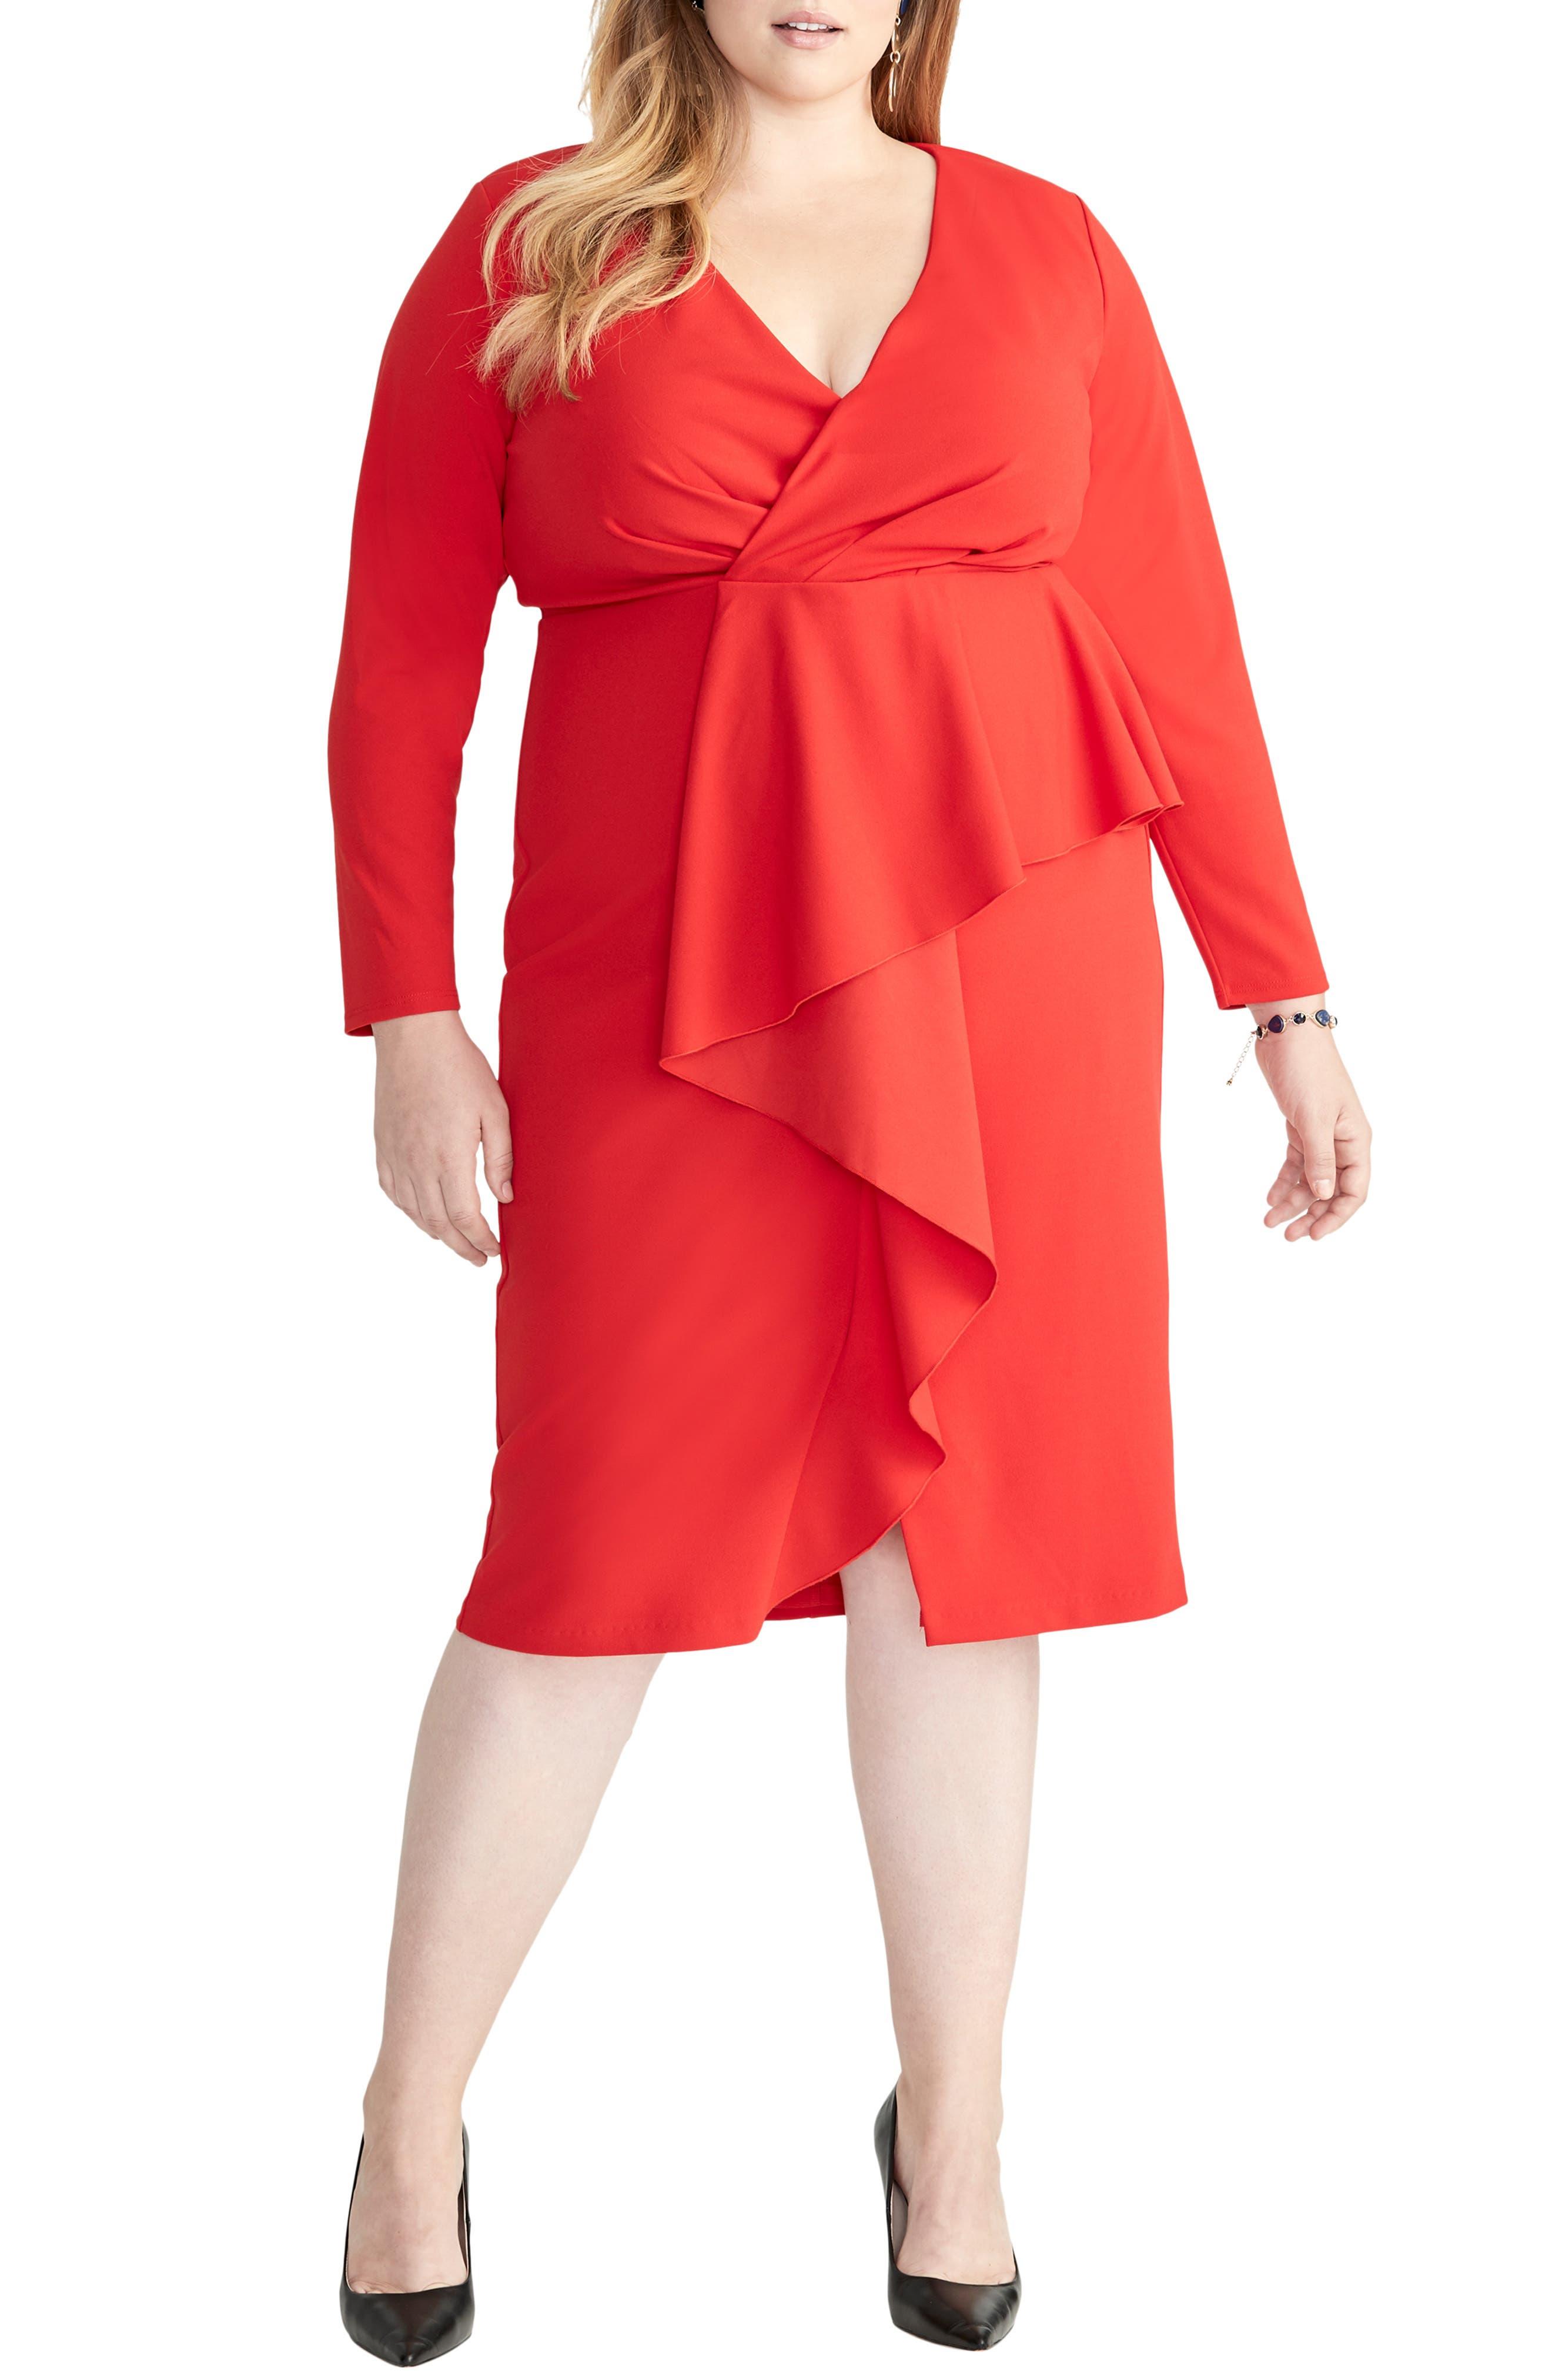 Plus Size Rachel Rachel Roy Ruffle Front Faux Wrap Dress, Red